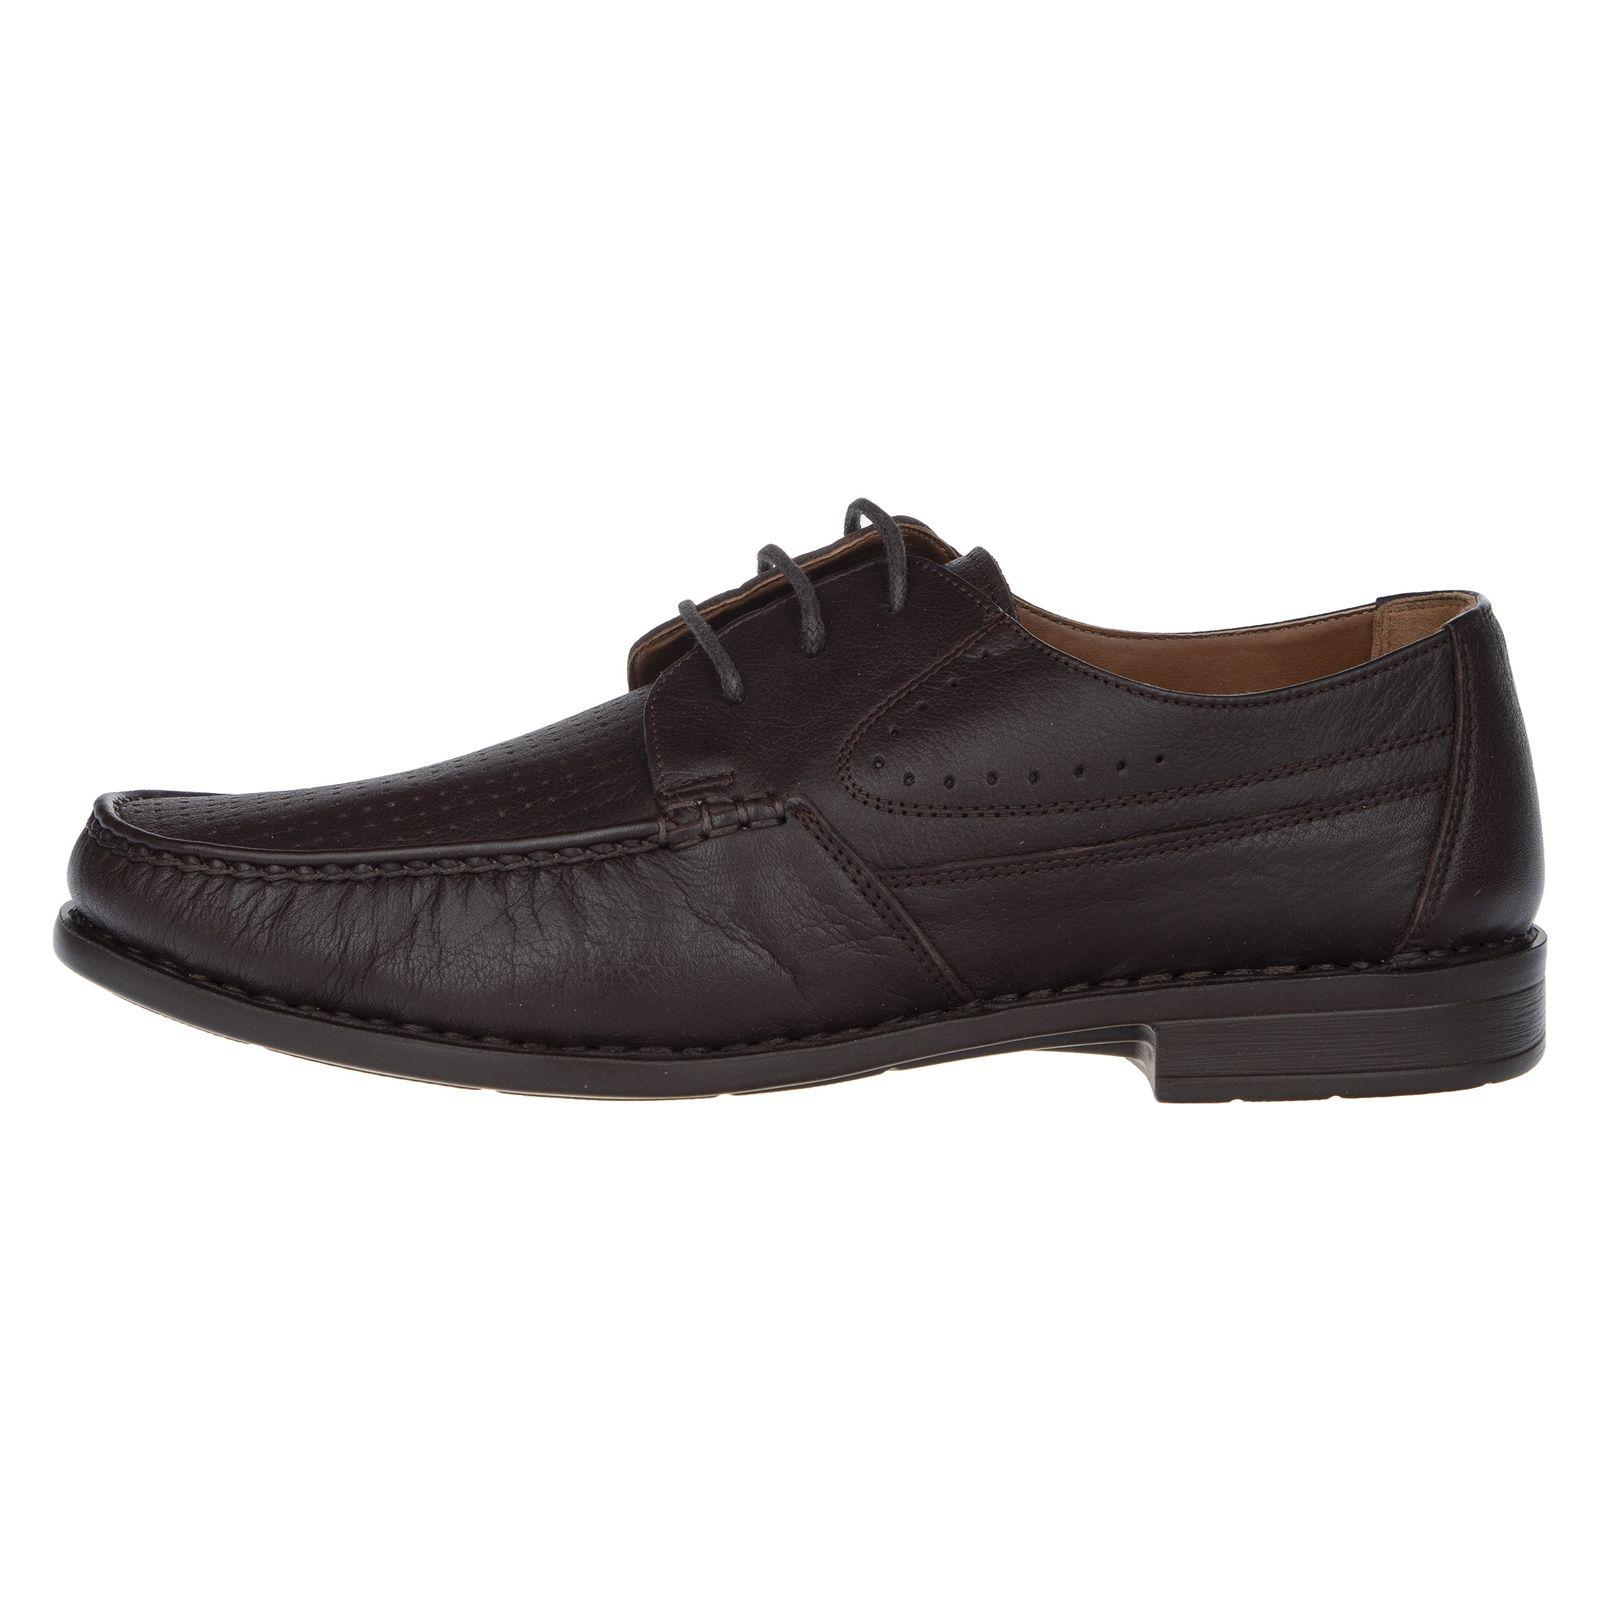 کفش روزمره مردانه پولاریس مدل 100296904-103 - قهوه ای - 2